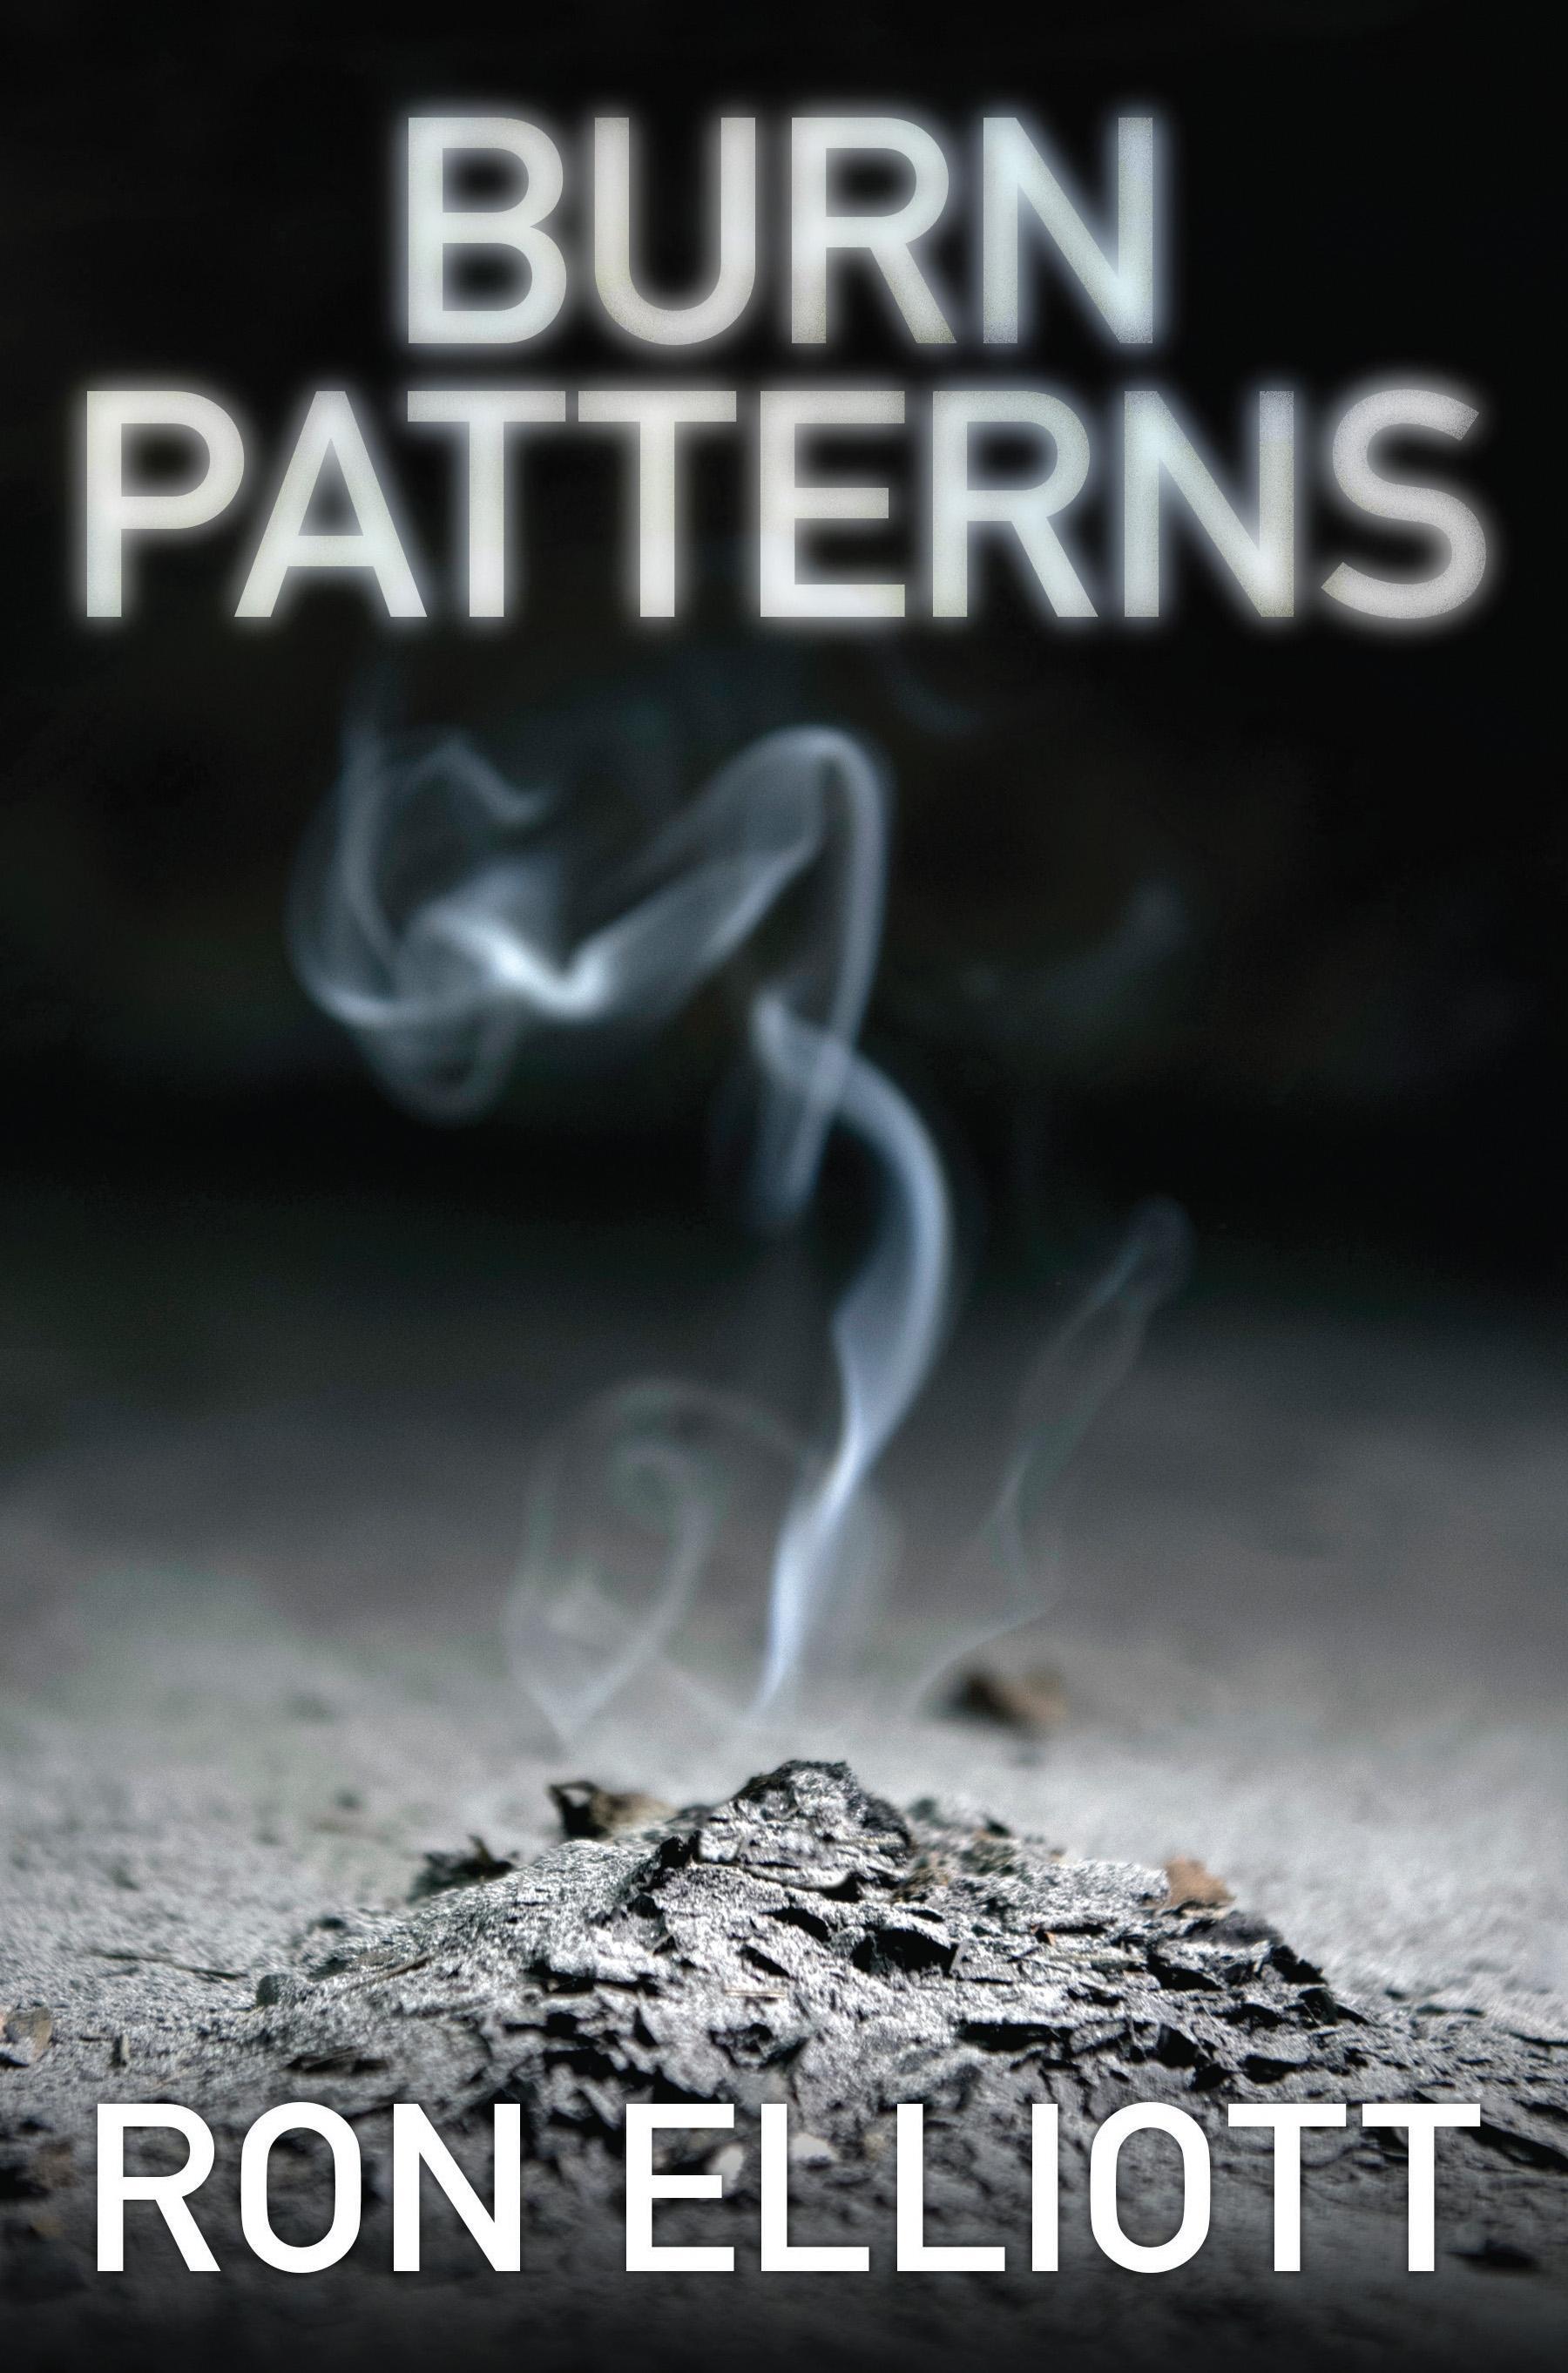 BurnPatterns